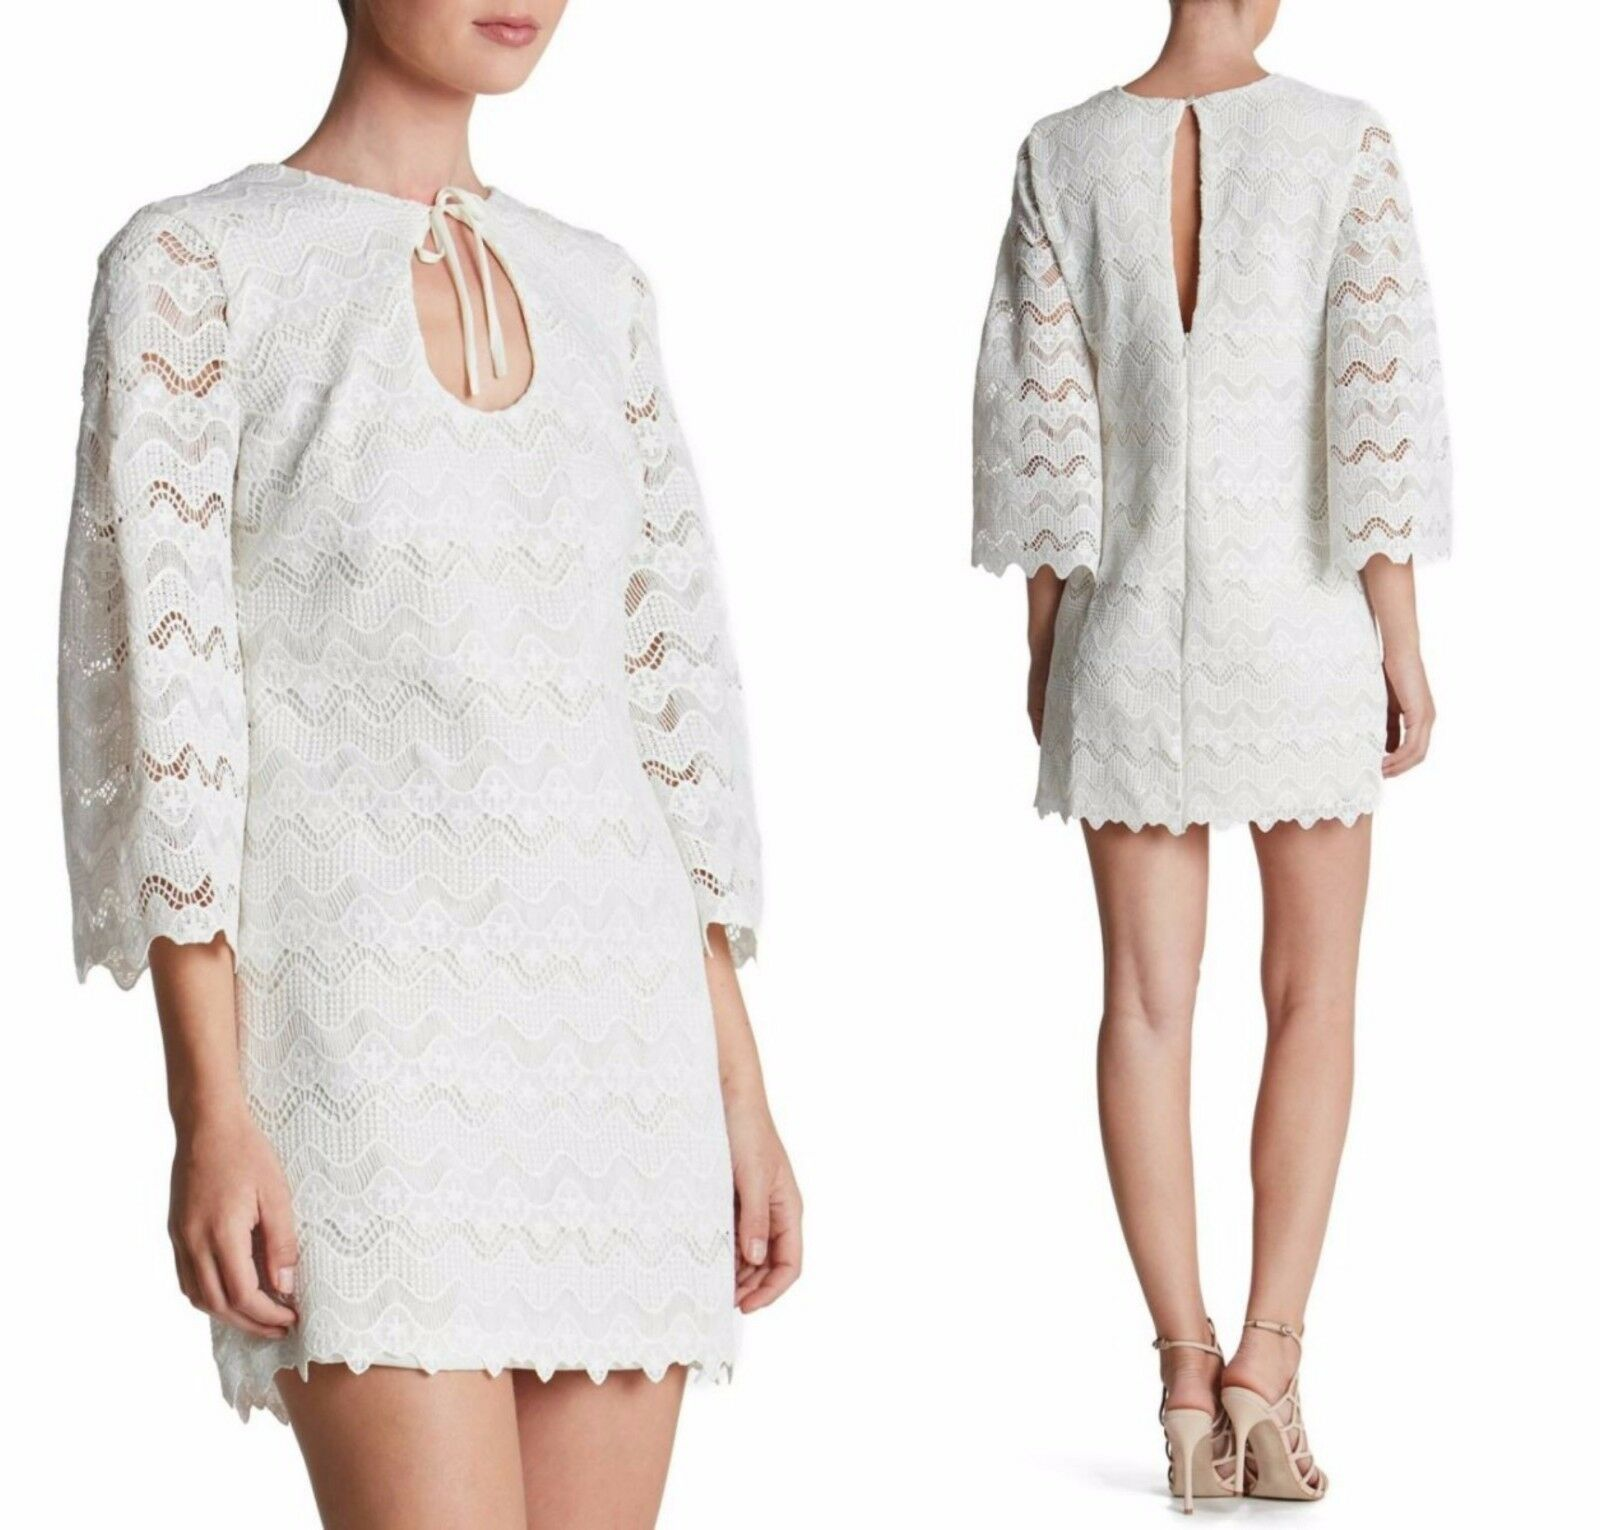 NEW Dress The Population 'Staci' Crochet Shift Dress White [SZ Small]  N781